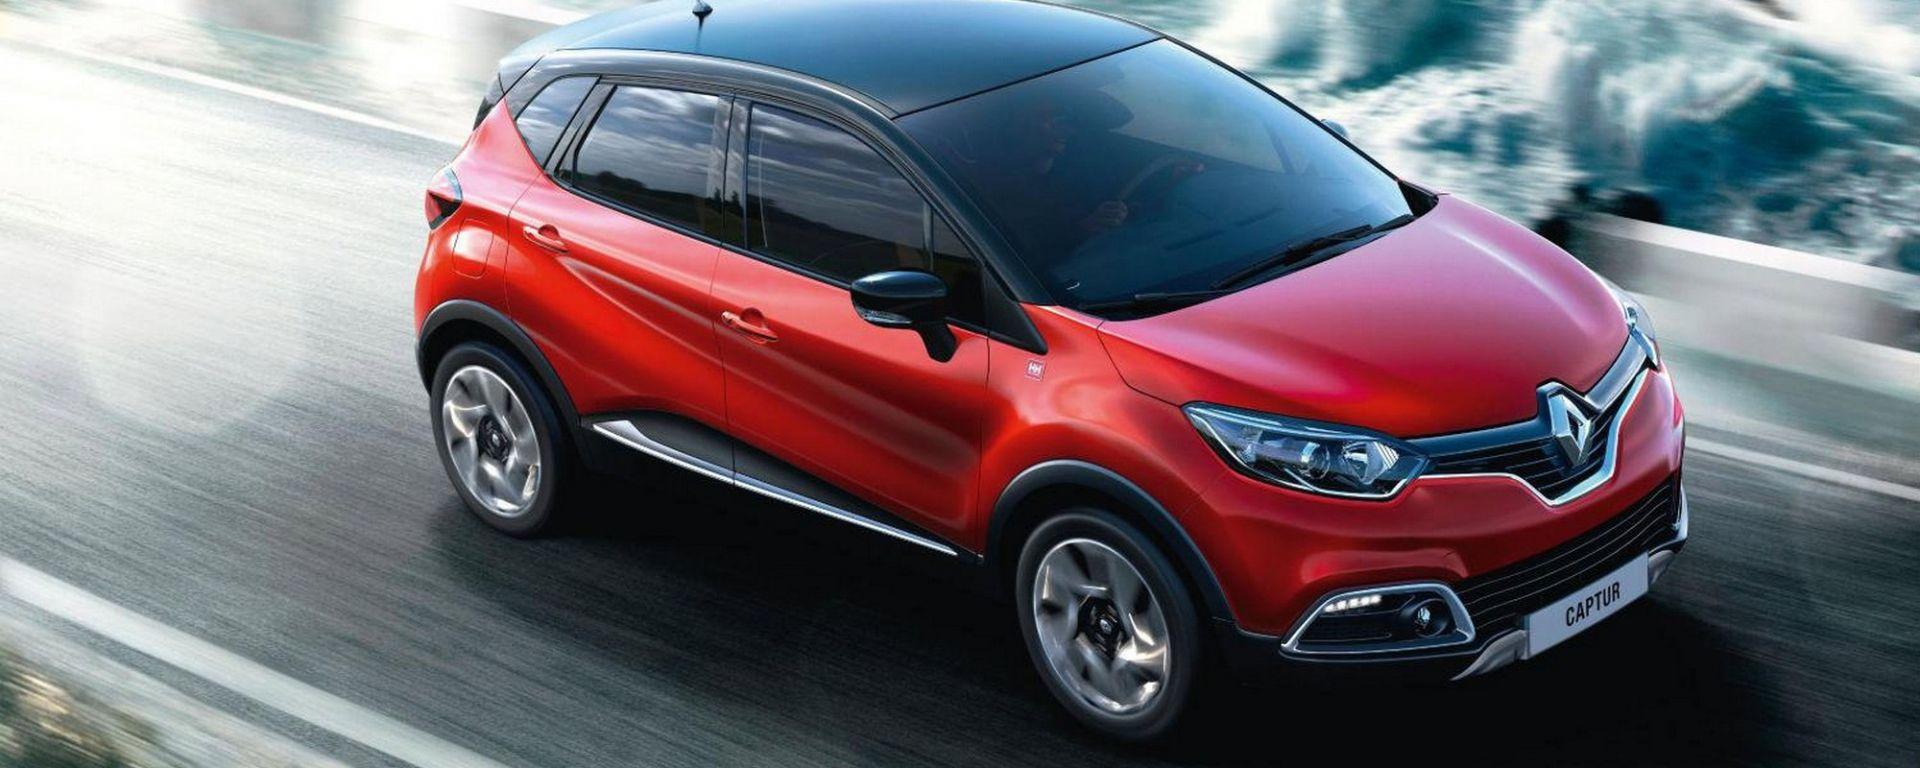 Nuova Renault Captur, nel 2020 la svolta ibrida